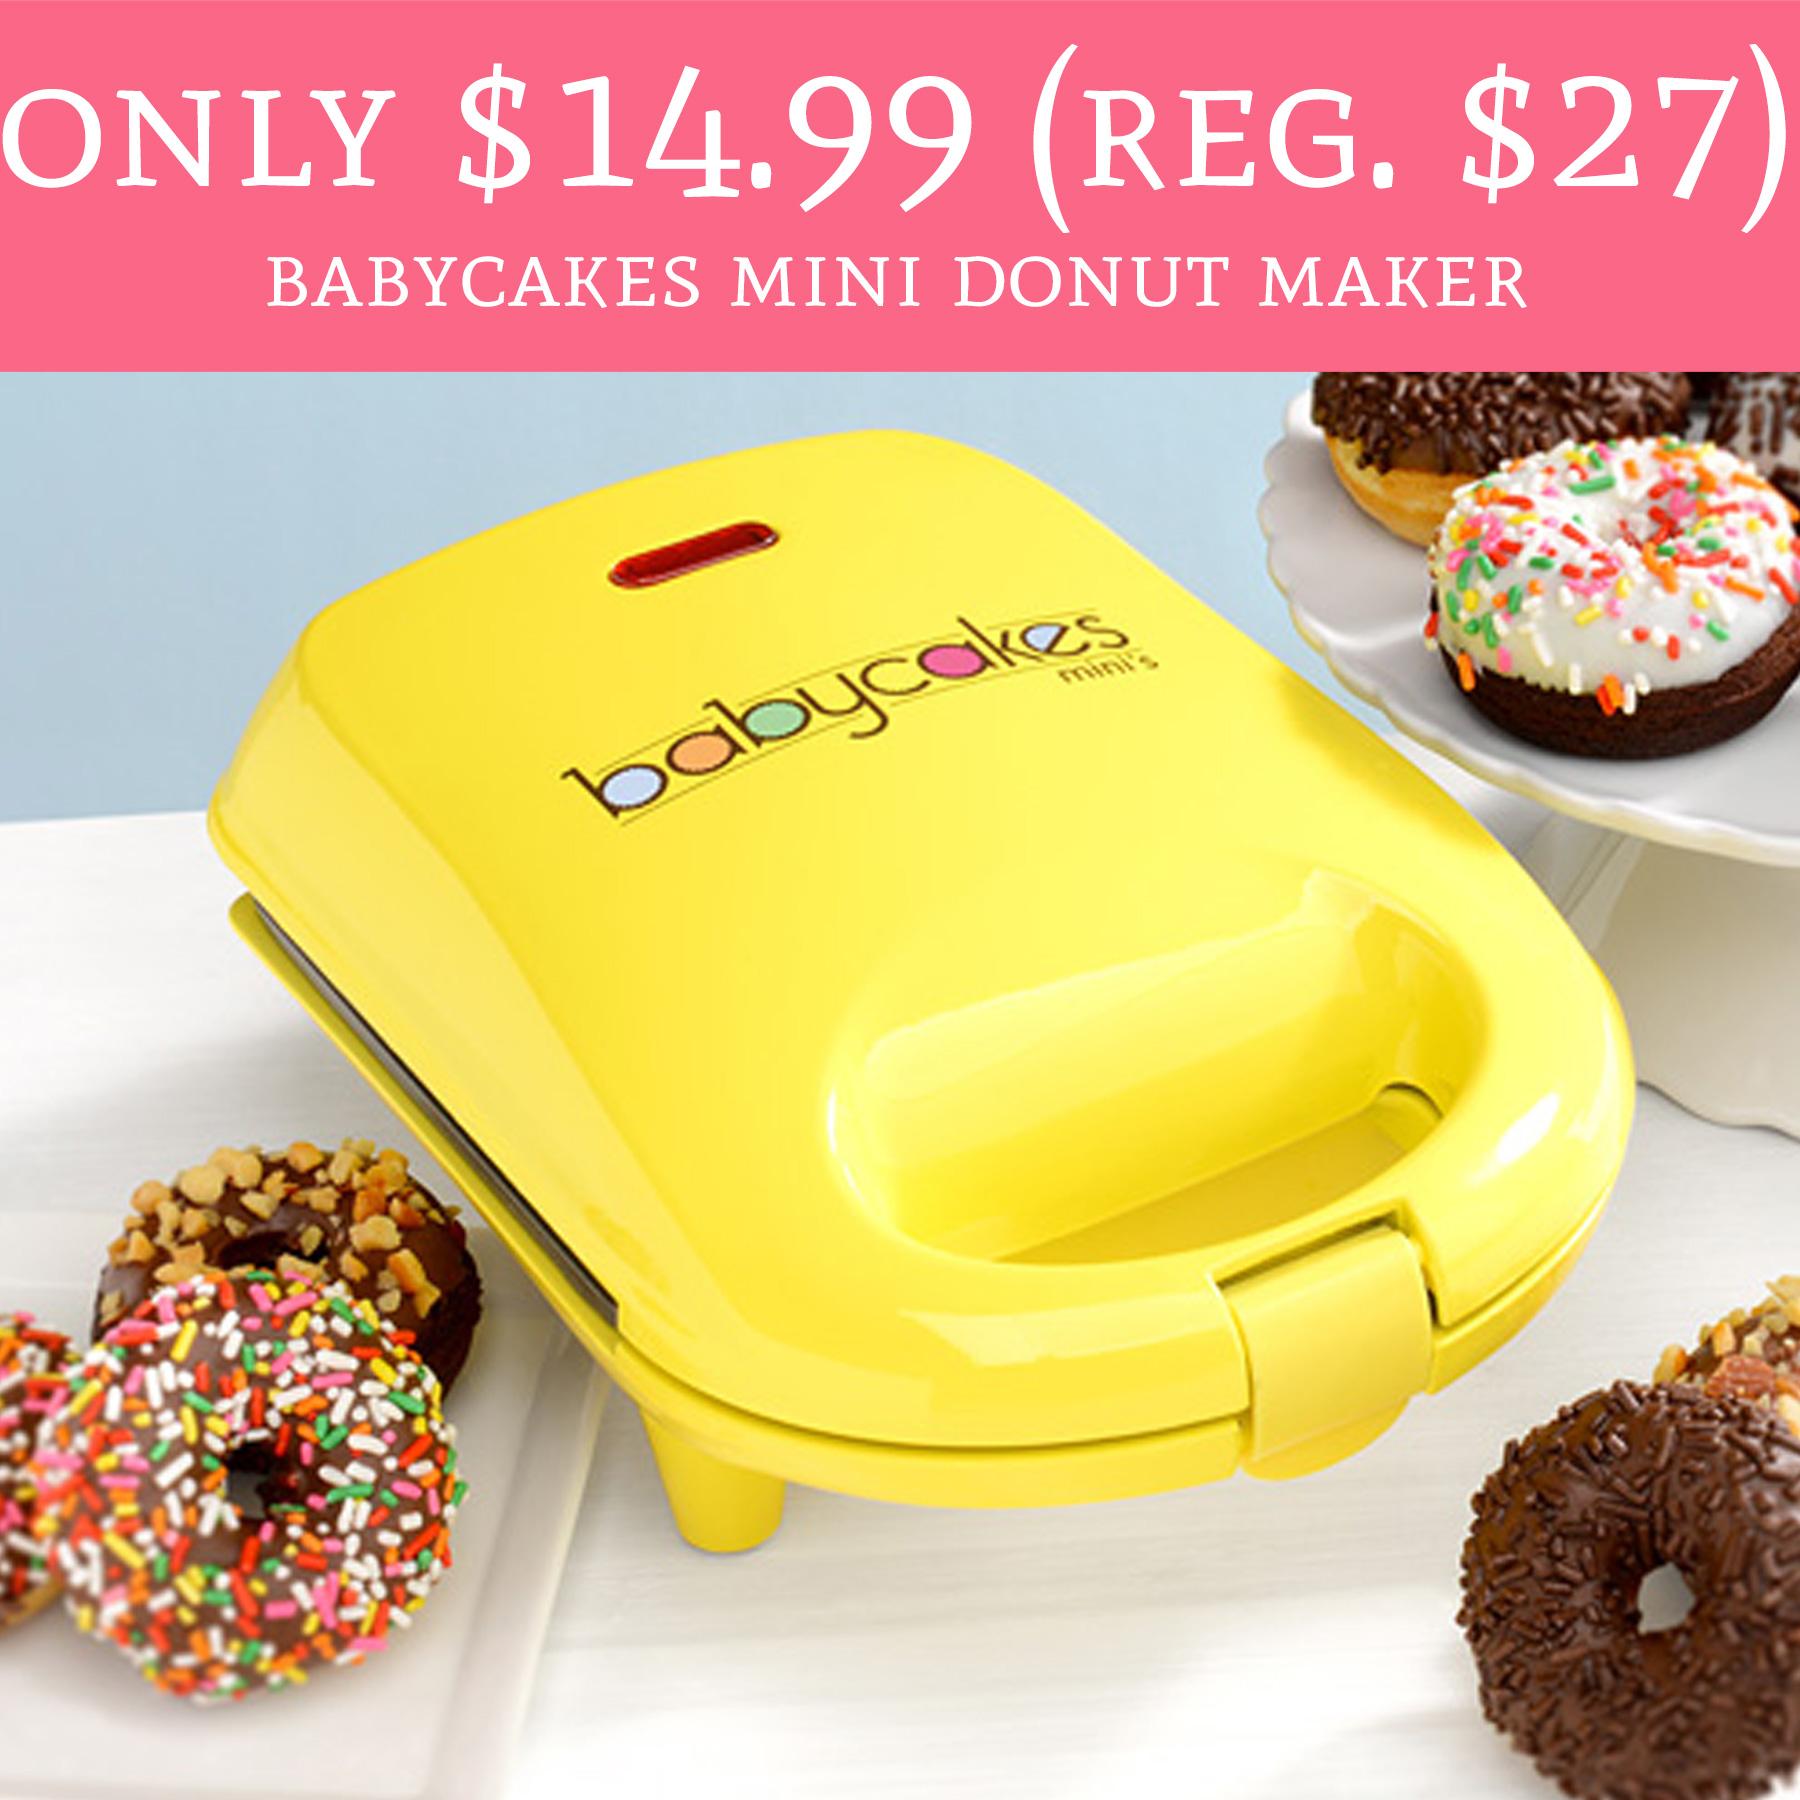 Only 1499 Regular 27 Babycakes Mini Donut Maker FREE Shipping